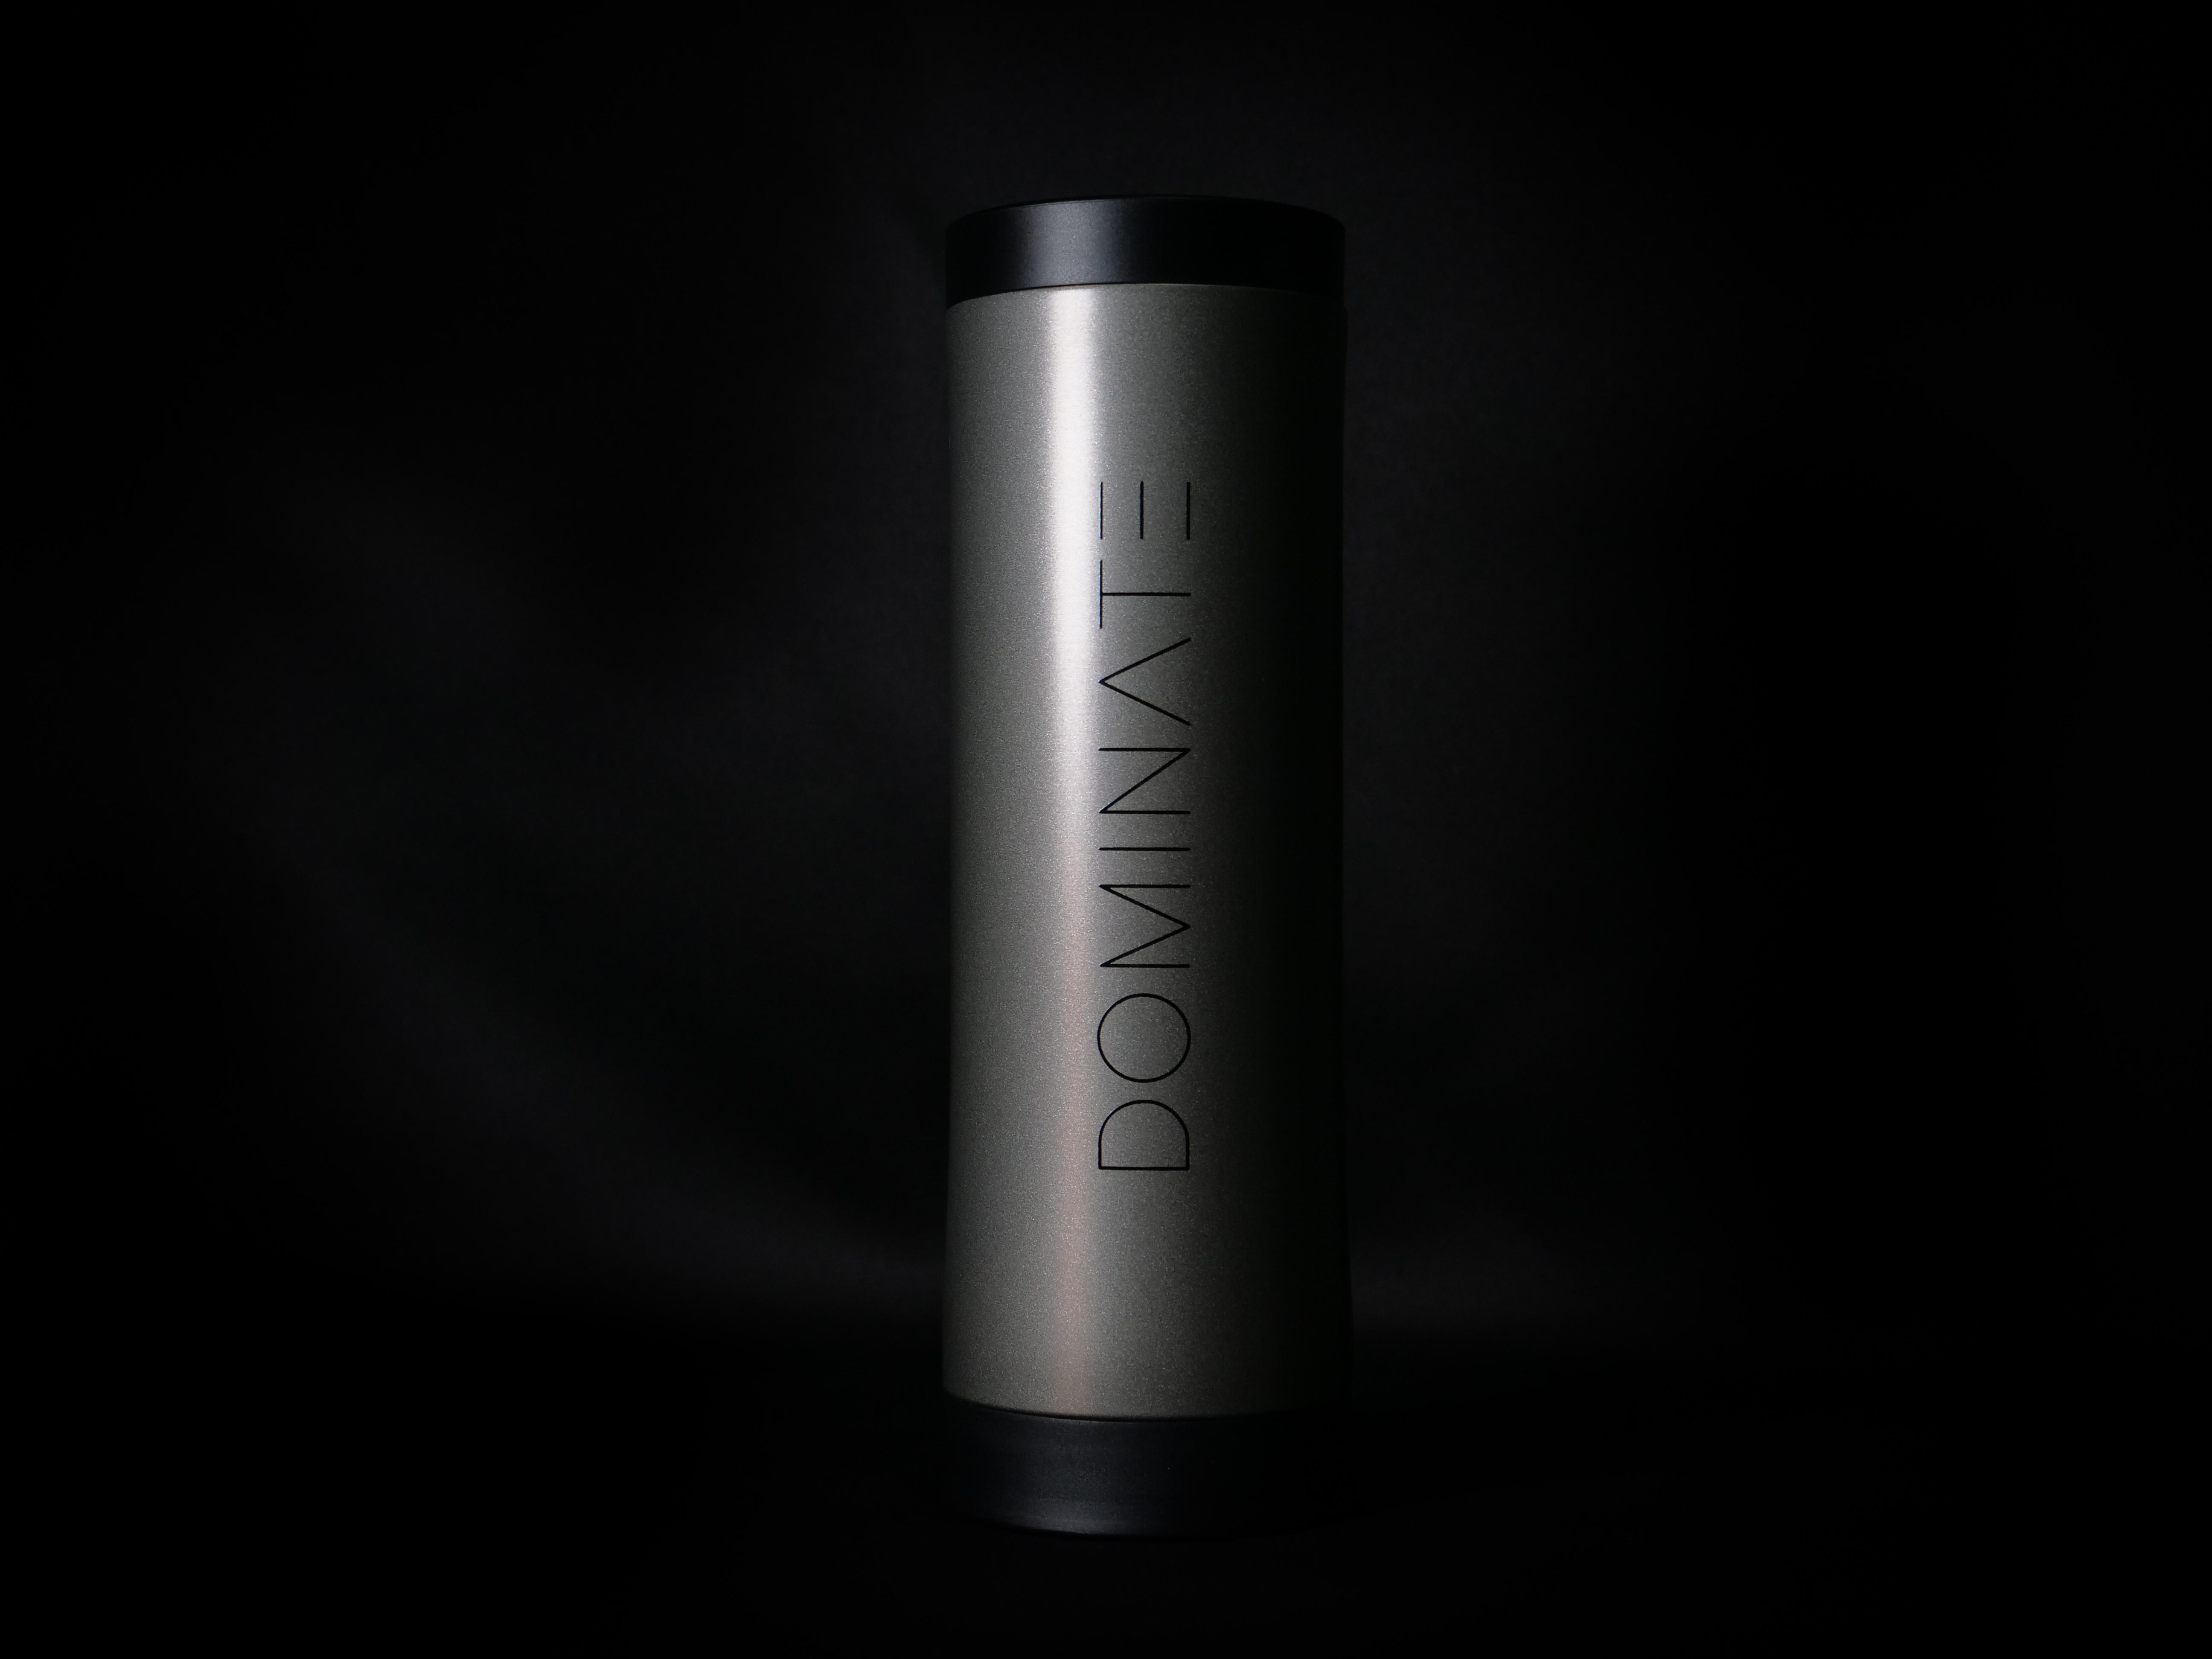 gray-dominate-tumbler